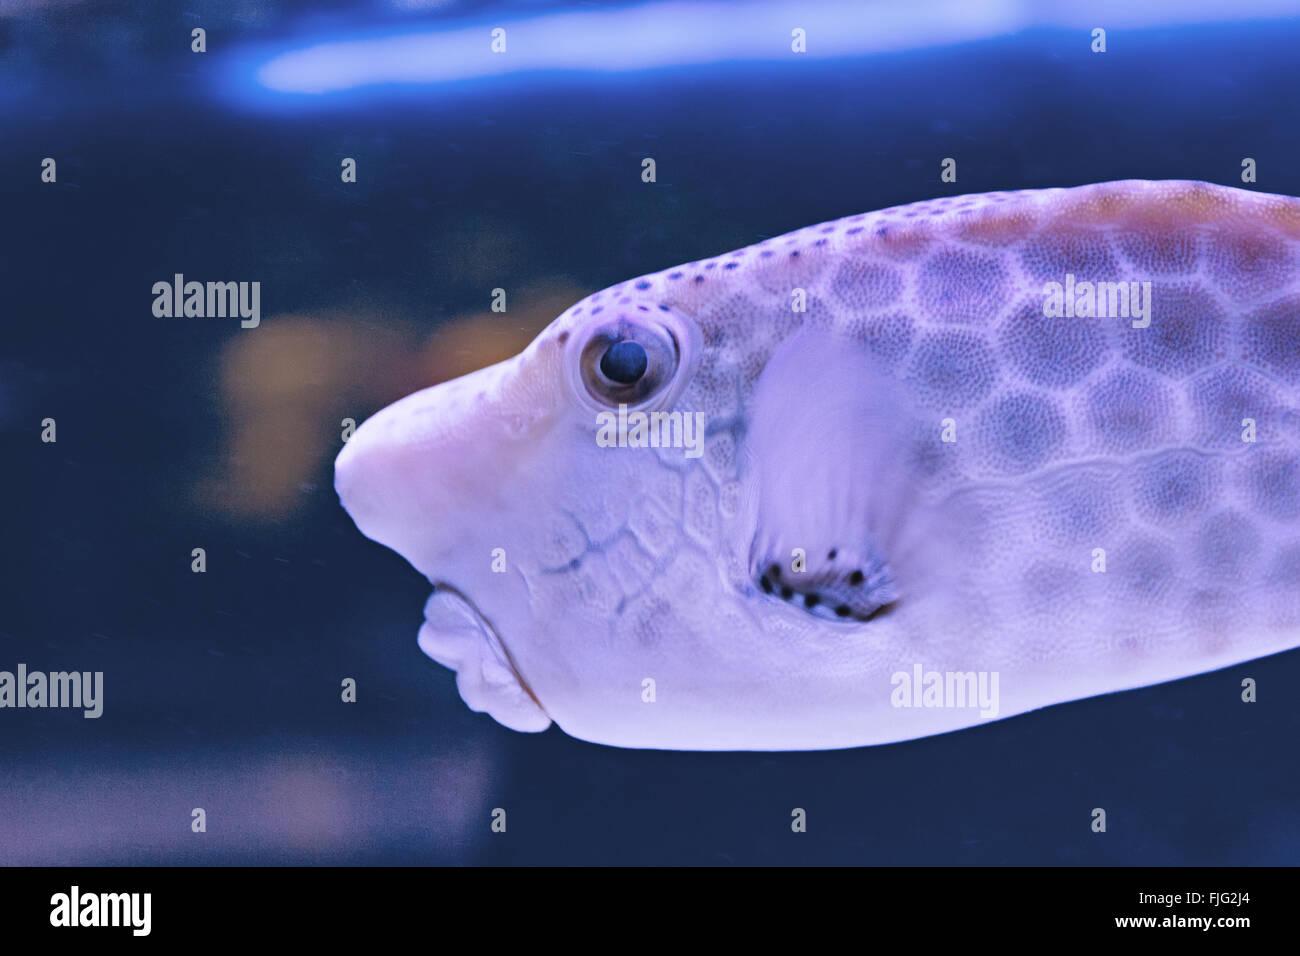 Thornback boxfish - solitair fish swimming close - Stock Image